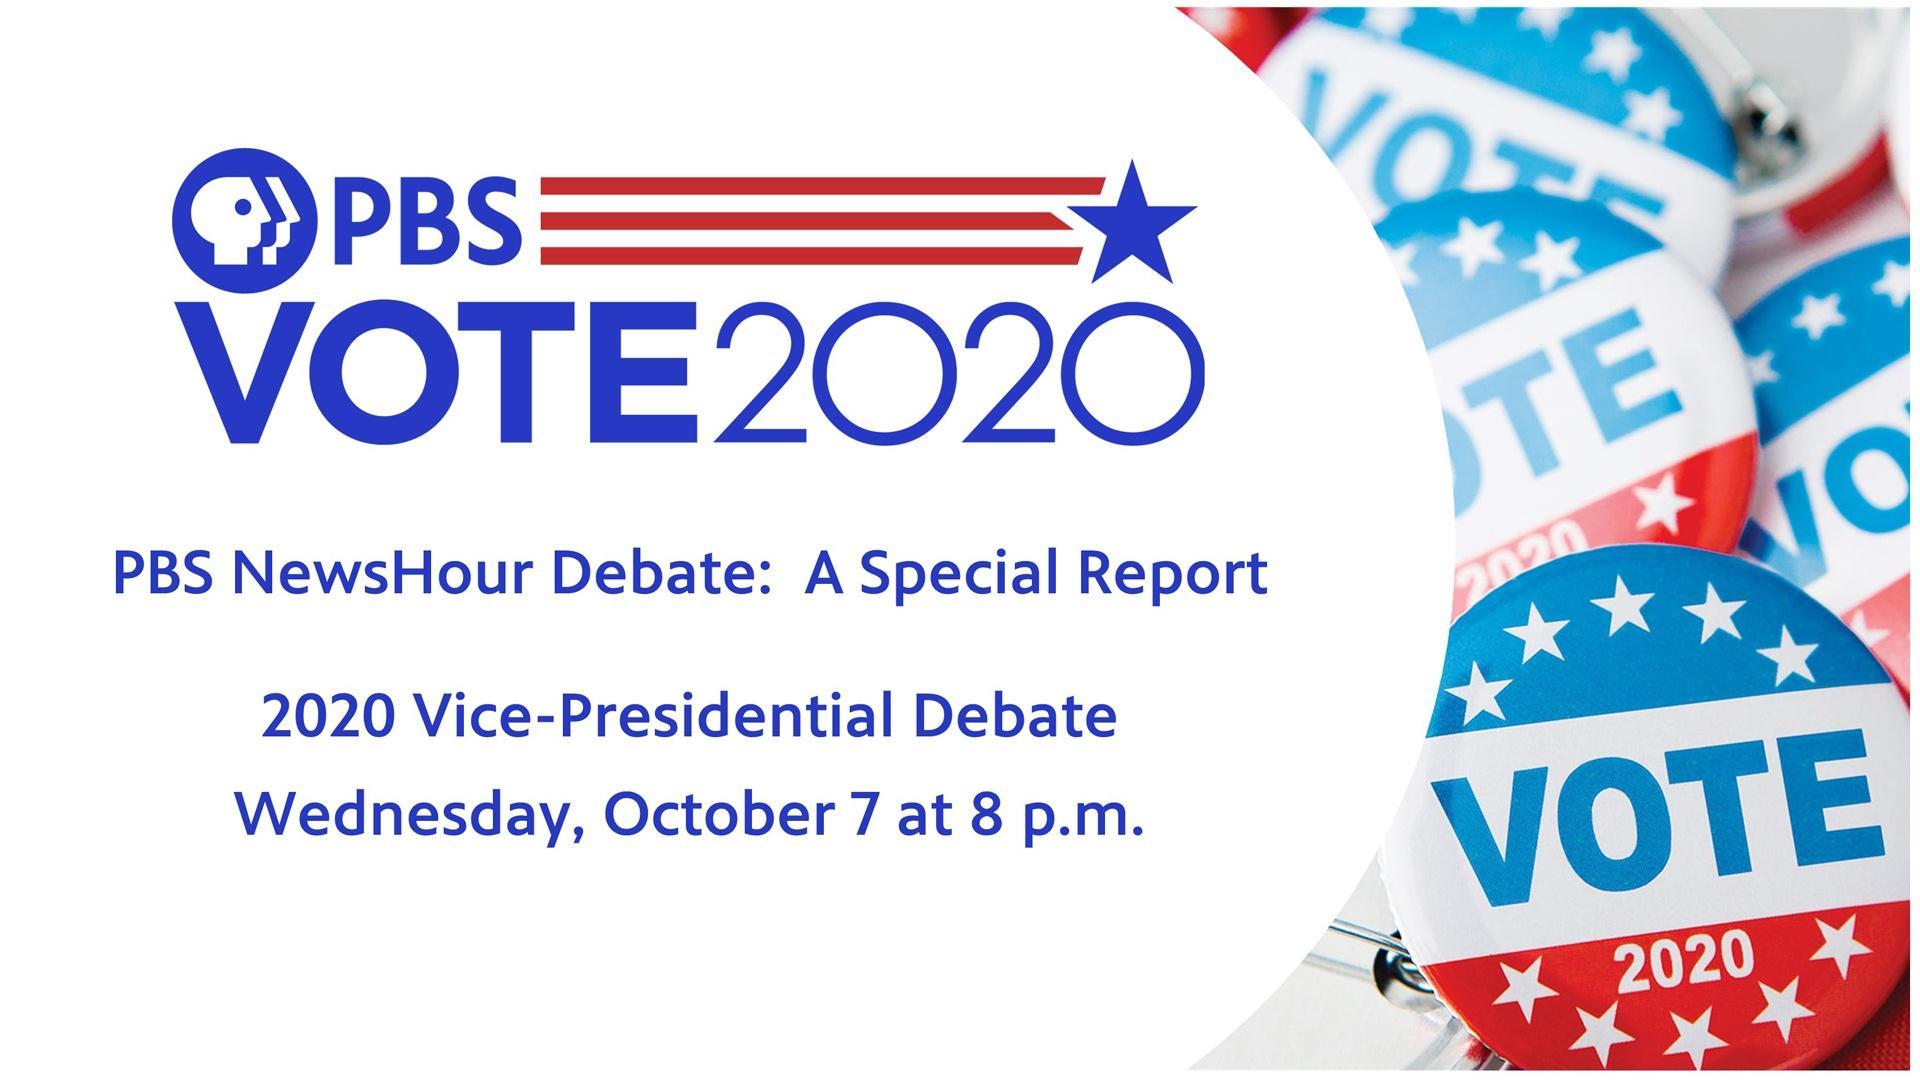 PBS NewsHour Debate: A Special Report